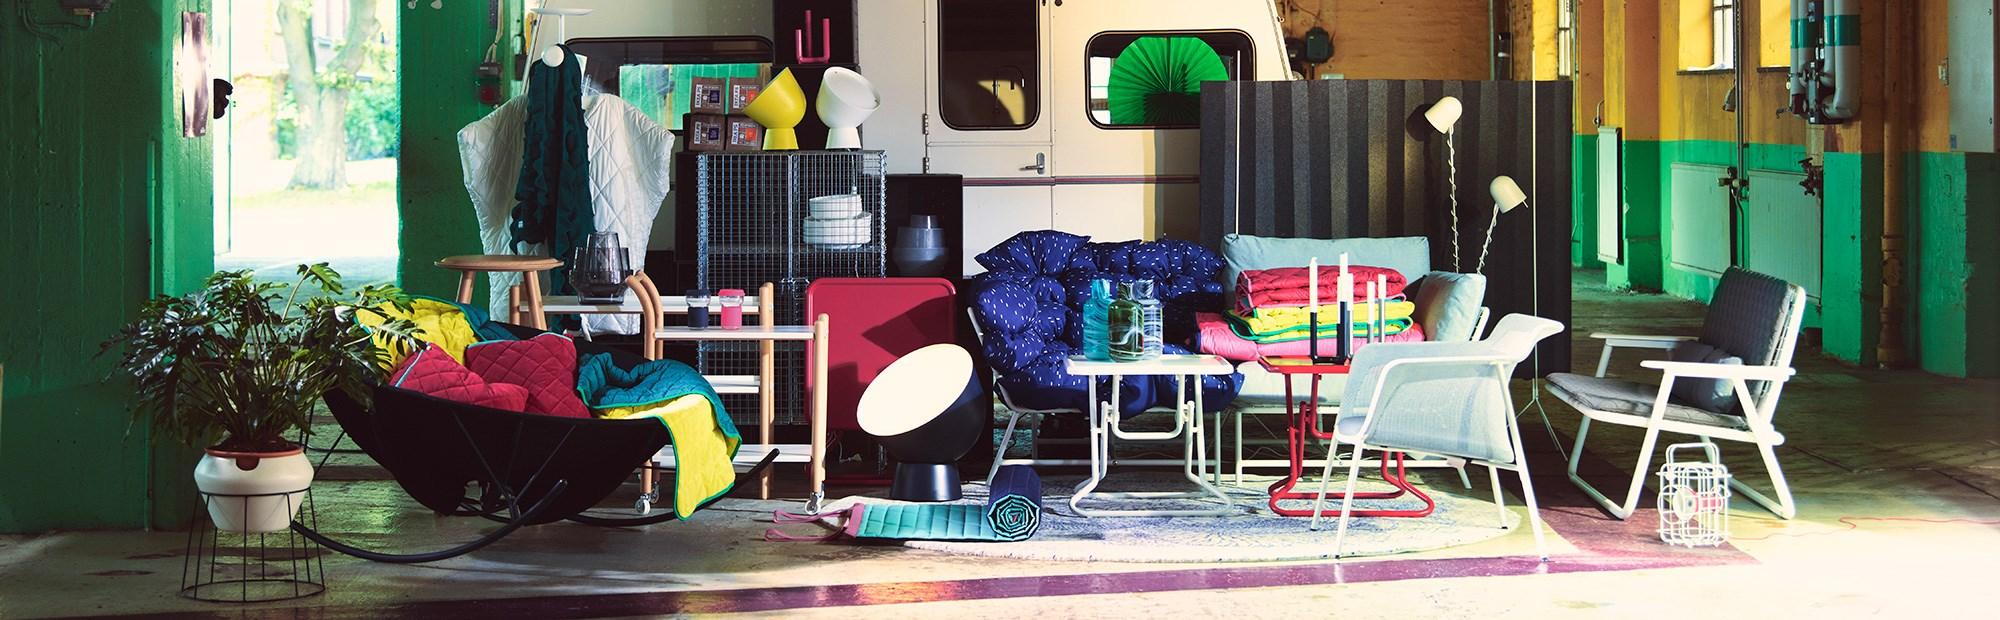 Ikea lanceert een nieuwe ikea ps collectie   lifestylelady.nl